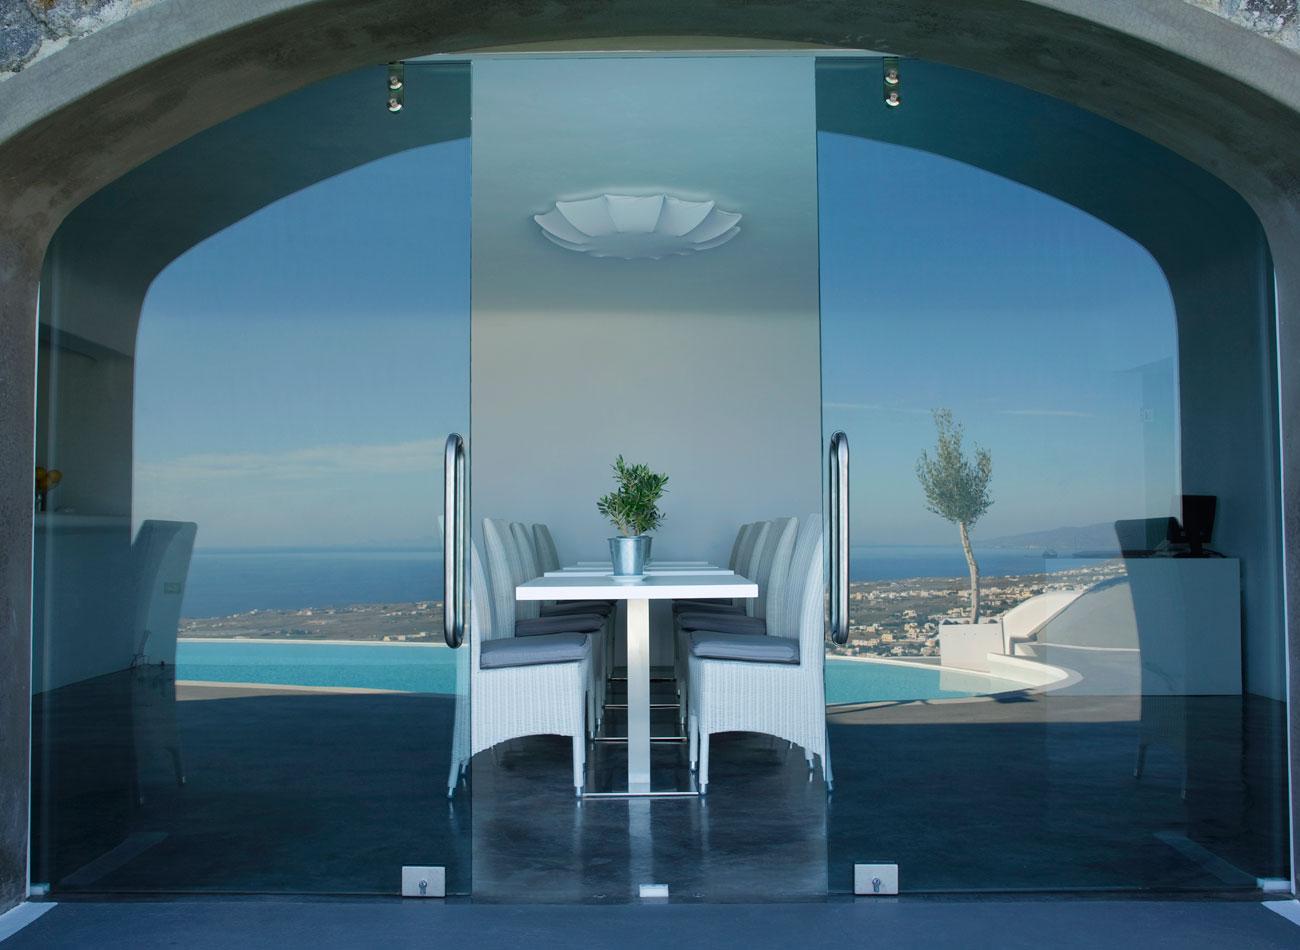 Carpe Diem Hotel Santorini 5 Star Luxury Hotel in